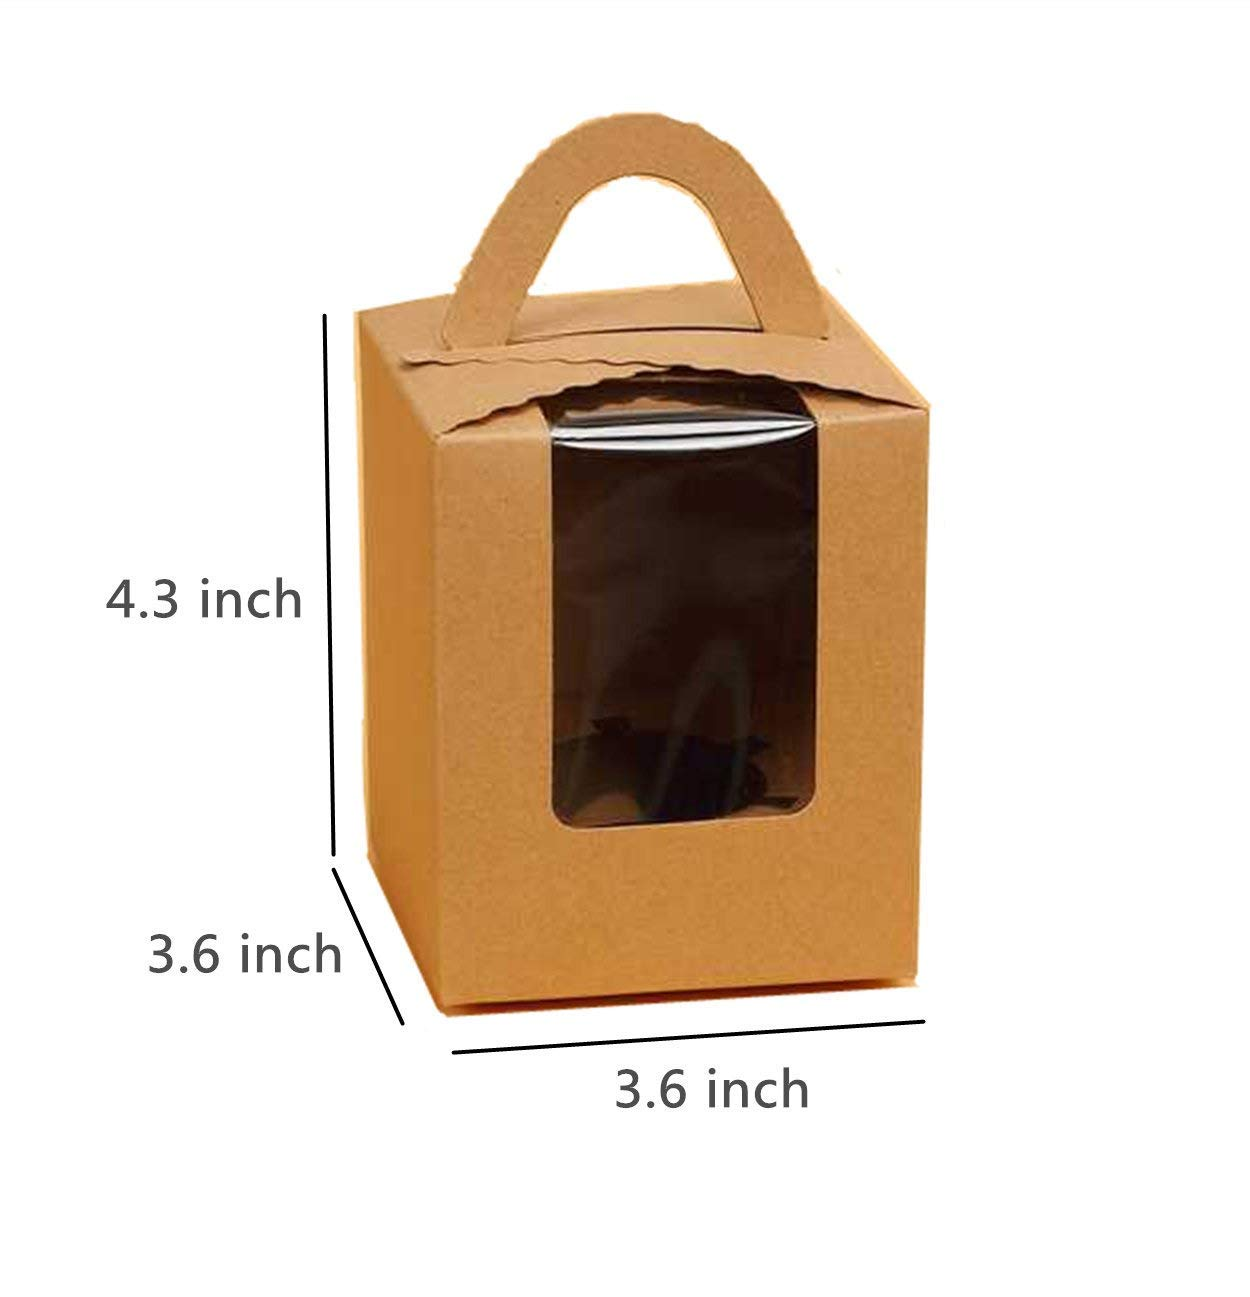 YOZATIA 12PCS Kraft Paper Cupcake Boxes with Window, 3.6''x3.6''x4.3'' Gift Box for Wedding Decoration, Party Favor